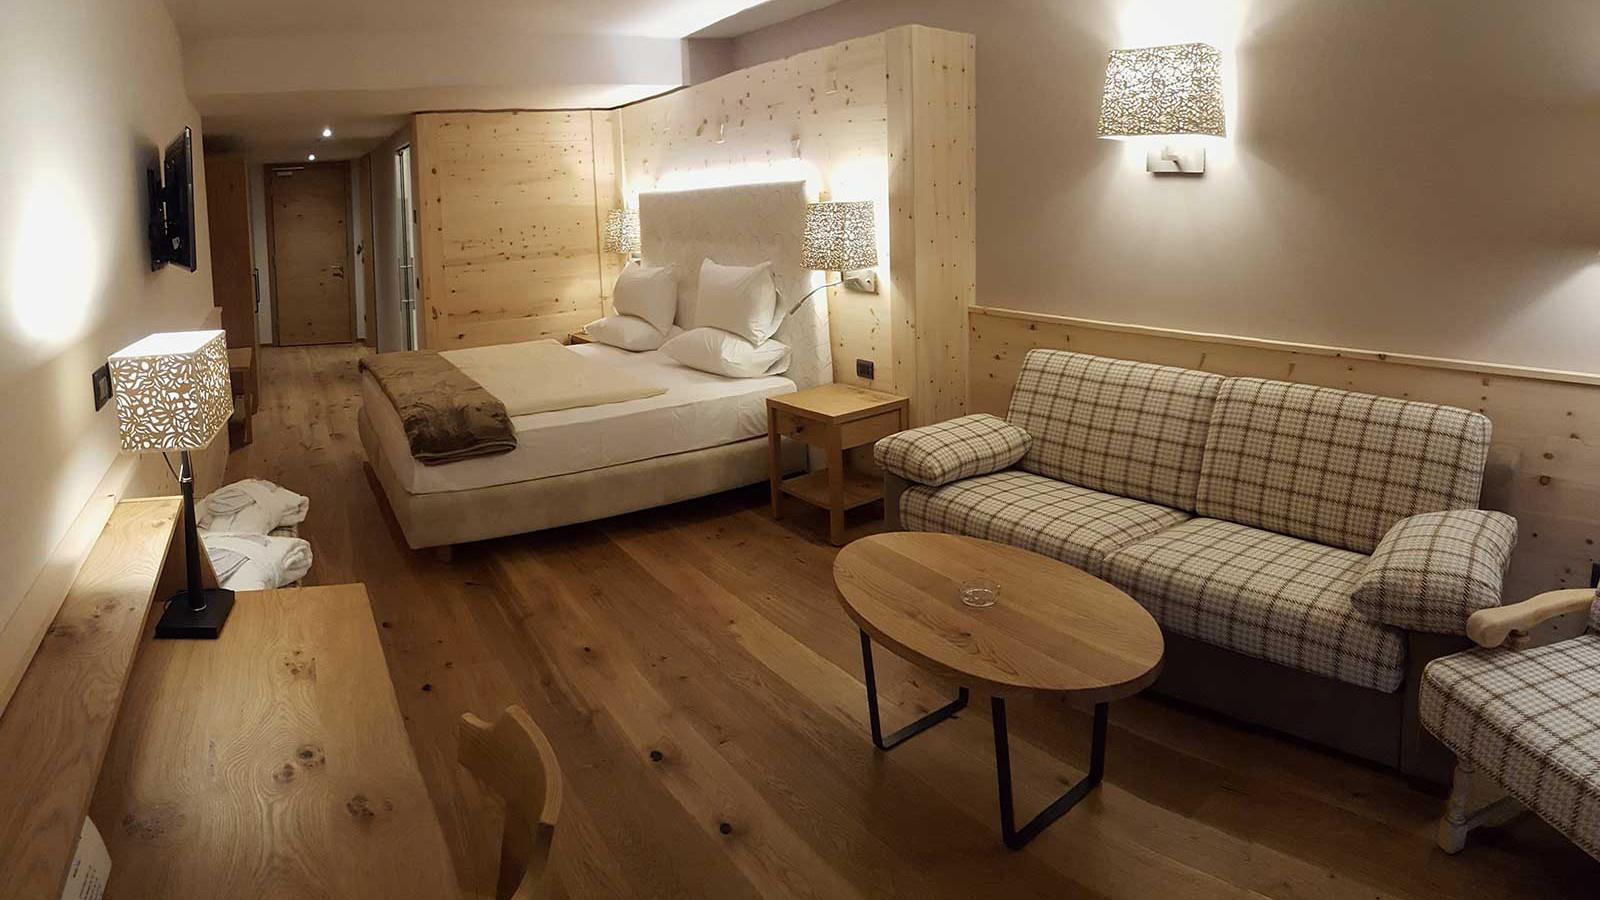 Hotel Cesa Tyrol - Rooms